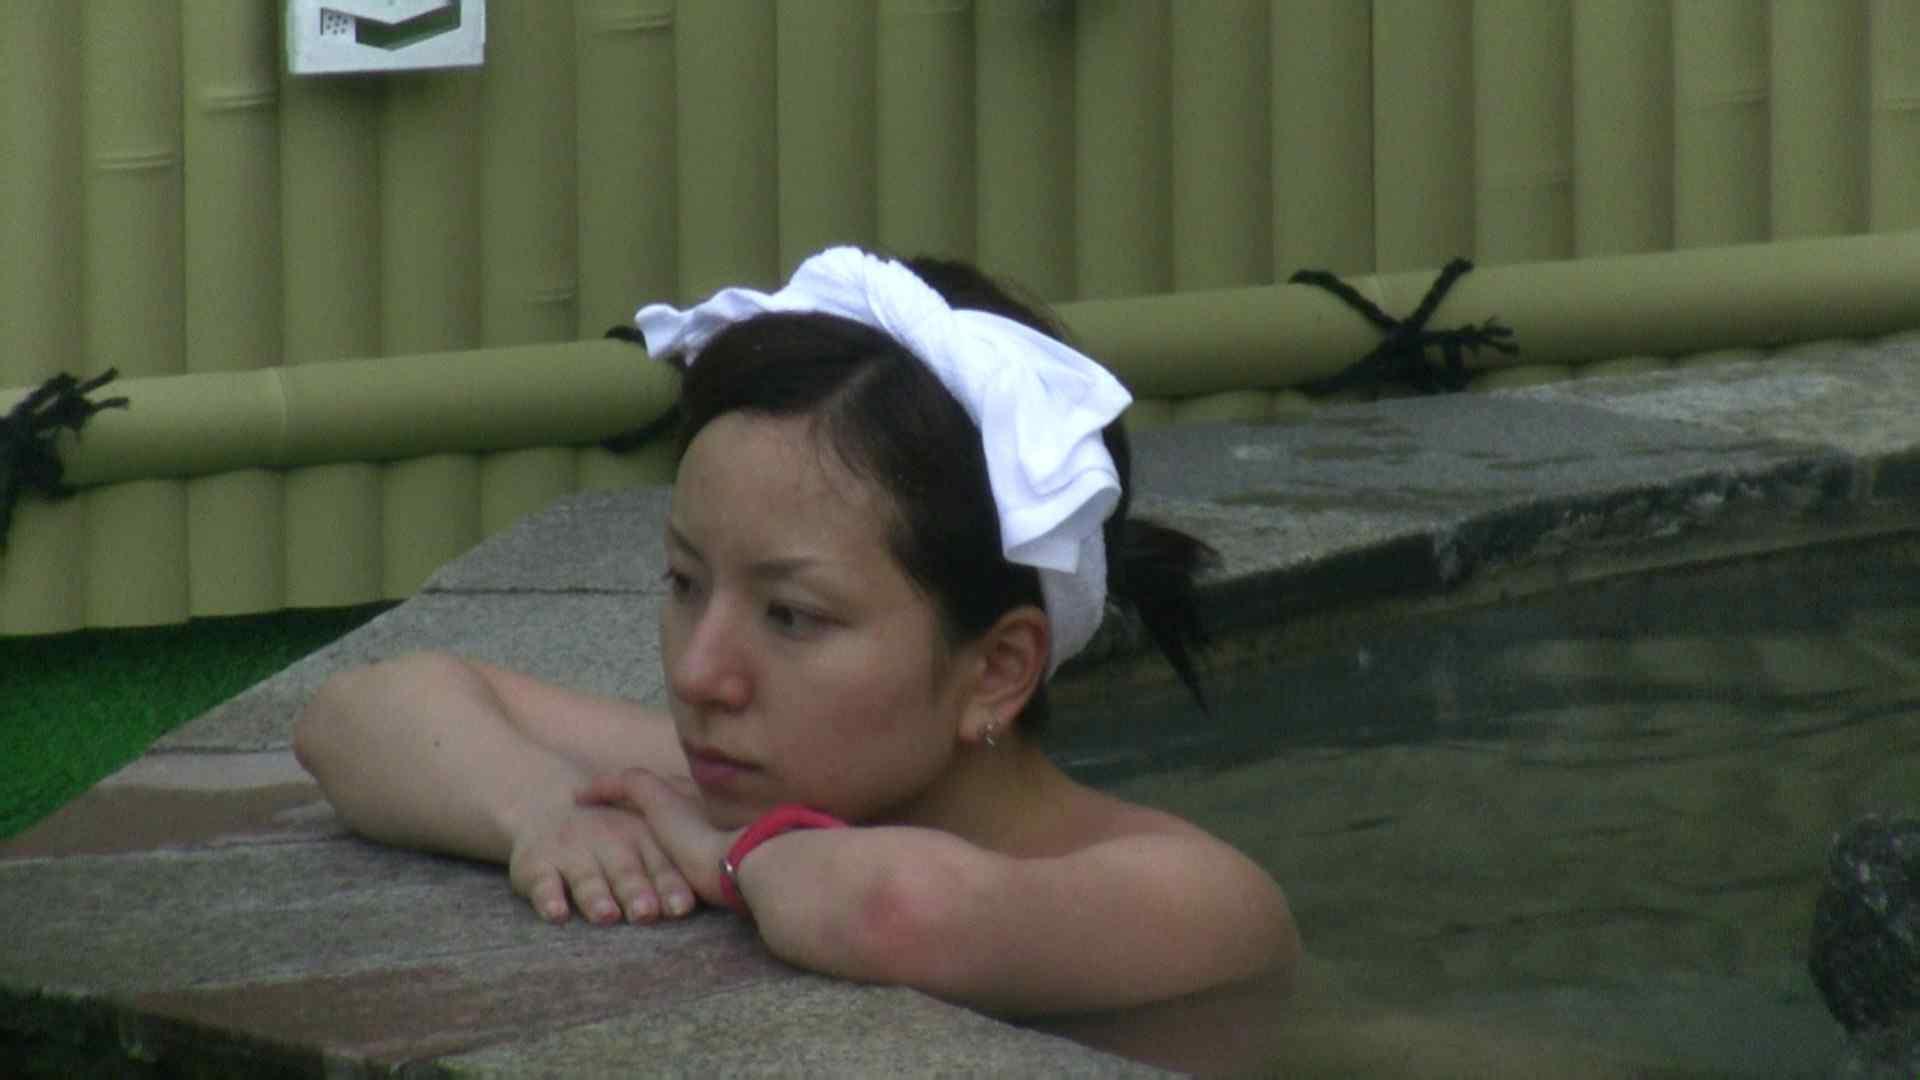 Aquaな露天風呂Vol.39【VIP】 綺麗なOLたち オマンコ動画キャプチャ 111枚 68